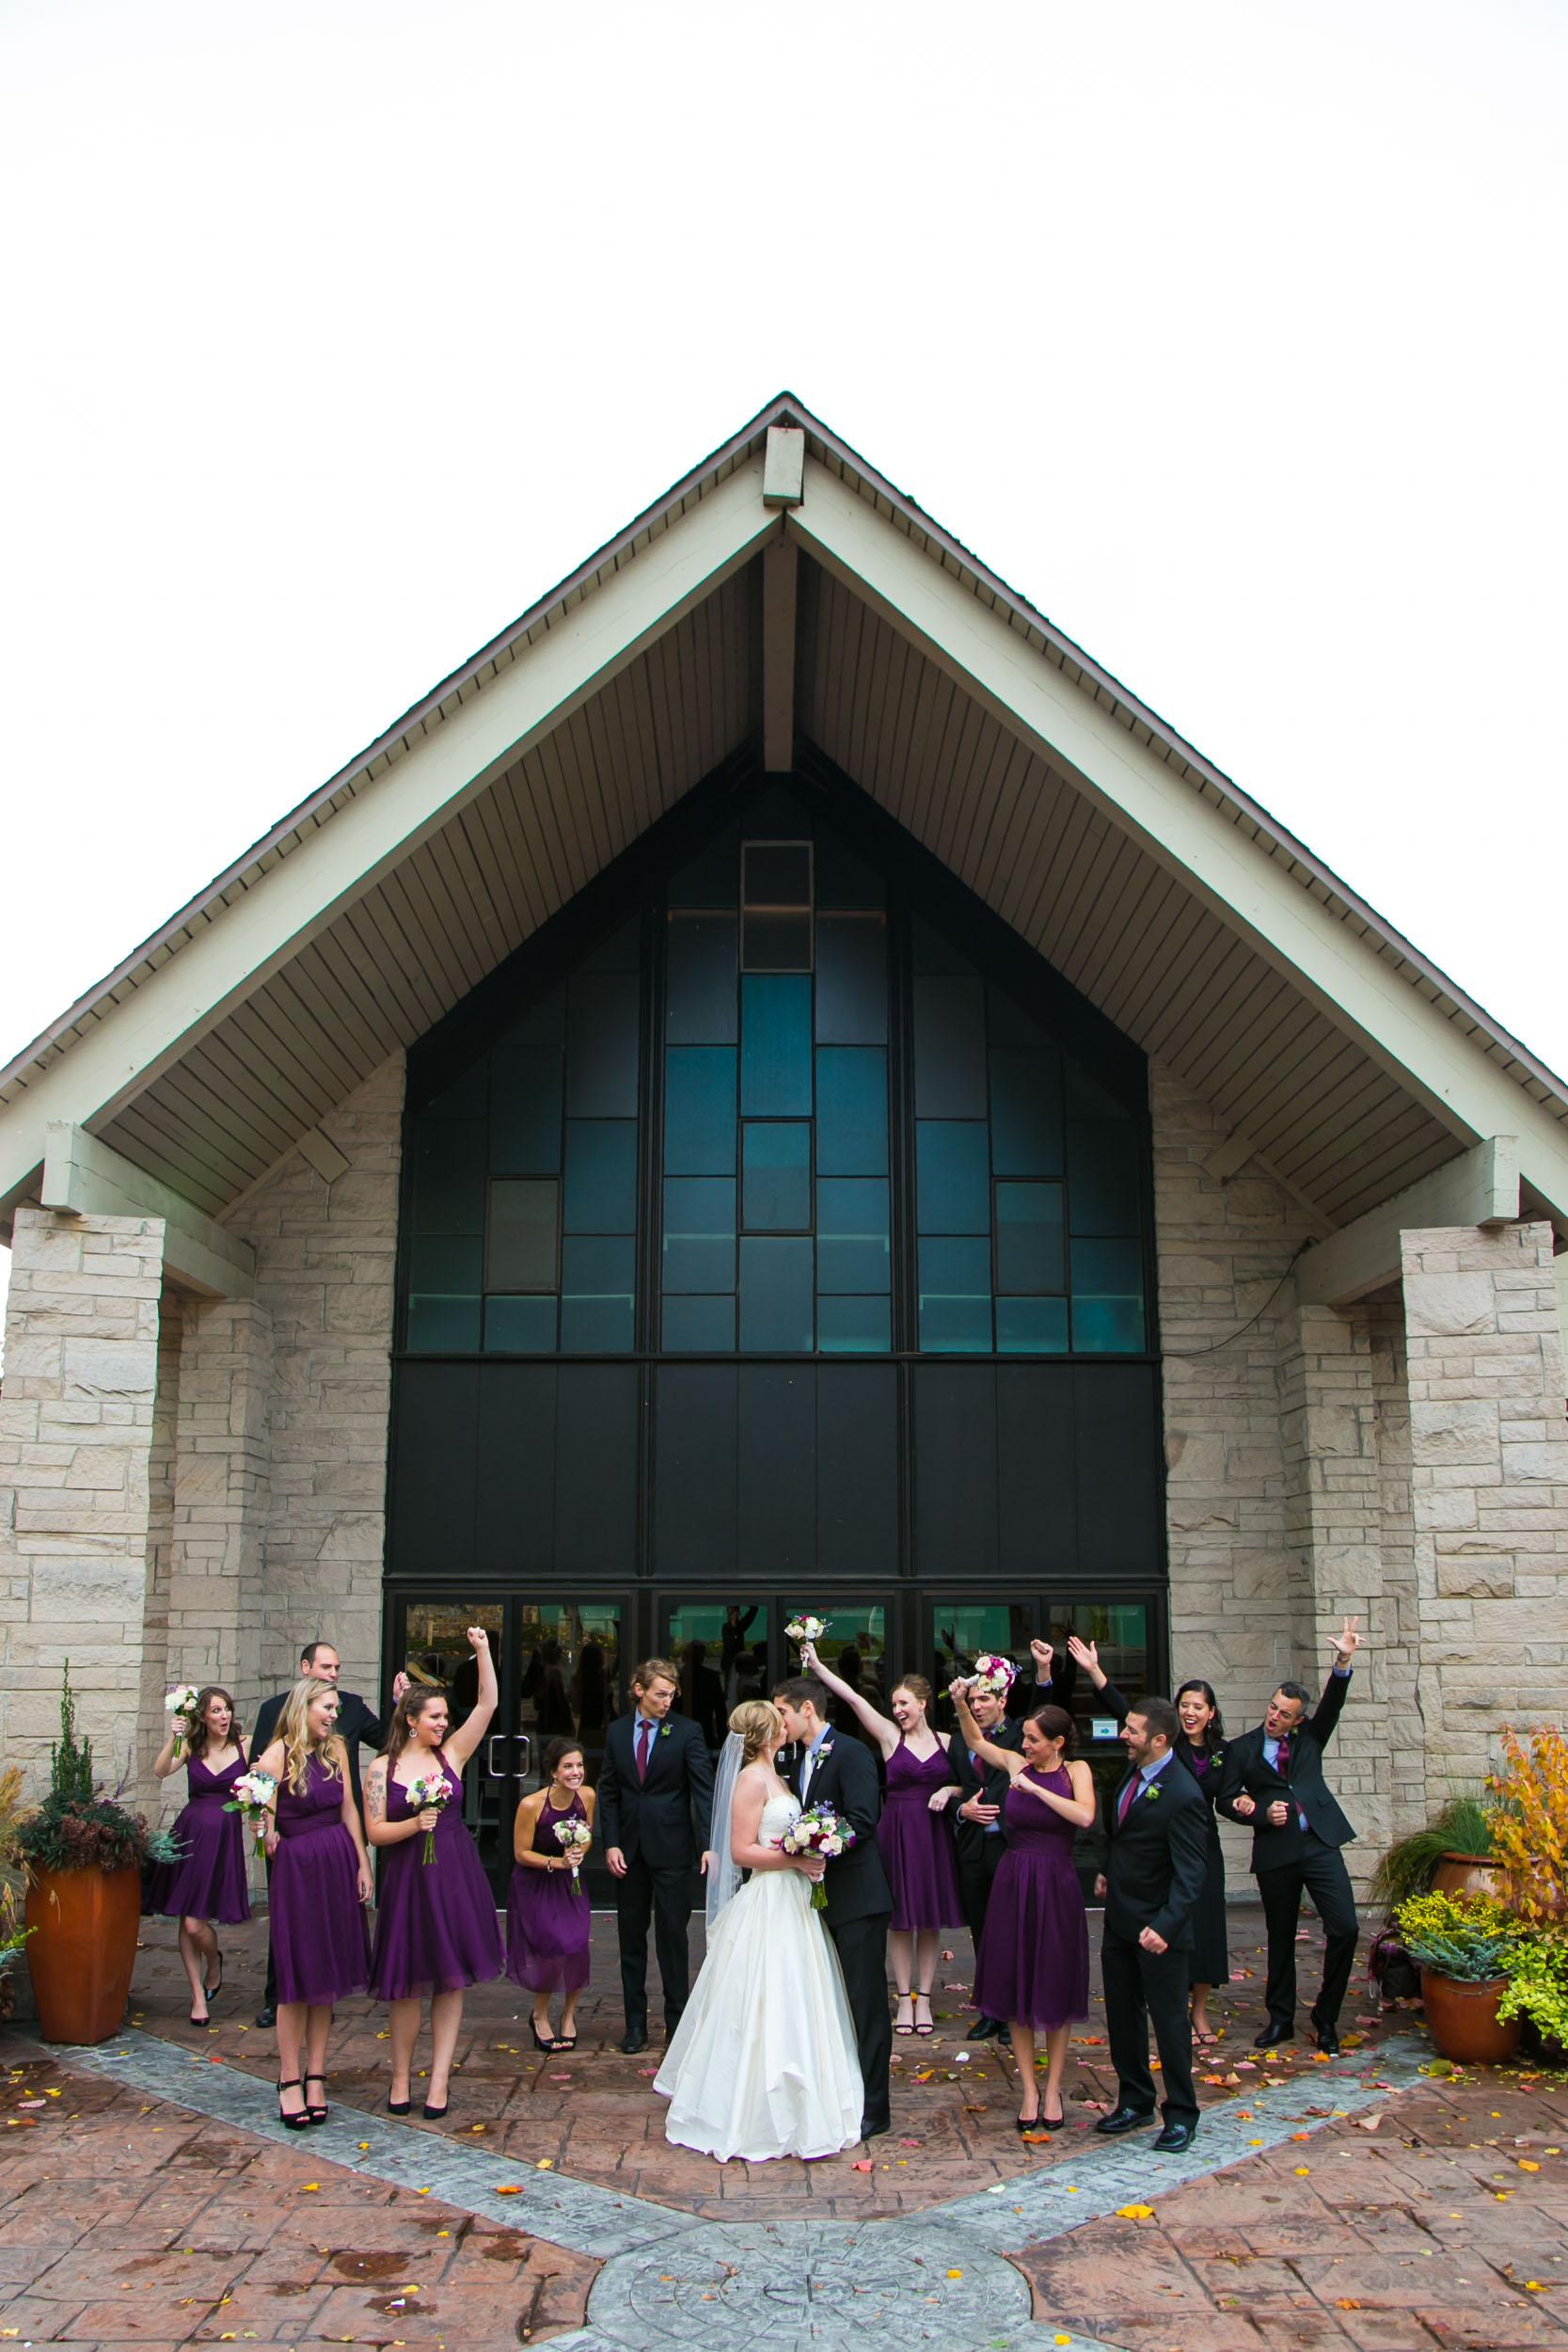 Seattle Community Church Wedding Photography | By G. Lin Photography | Fun wedding party photo